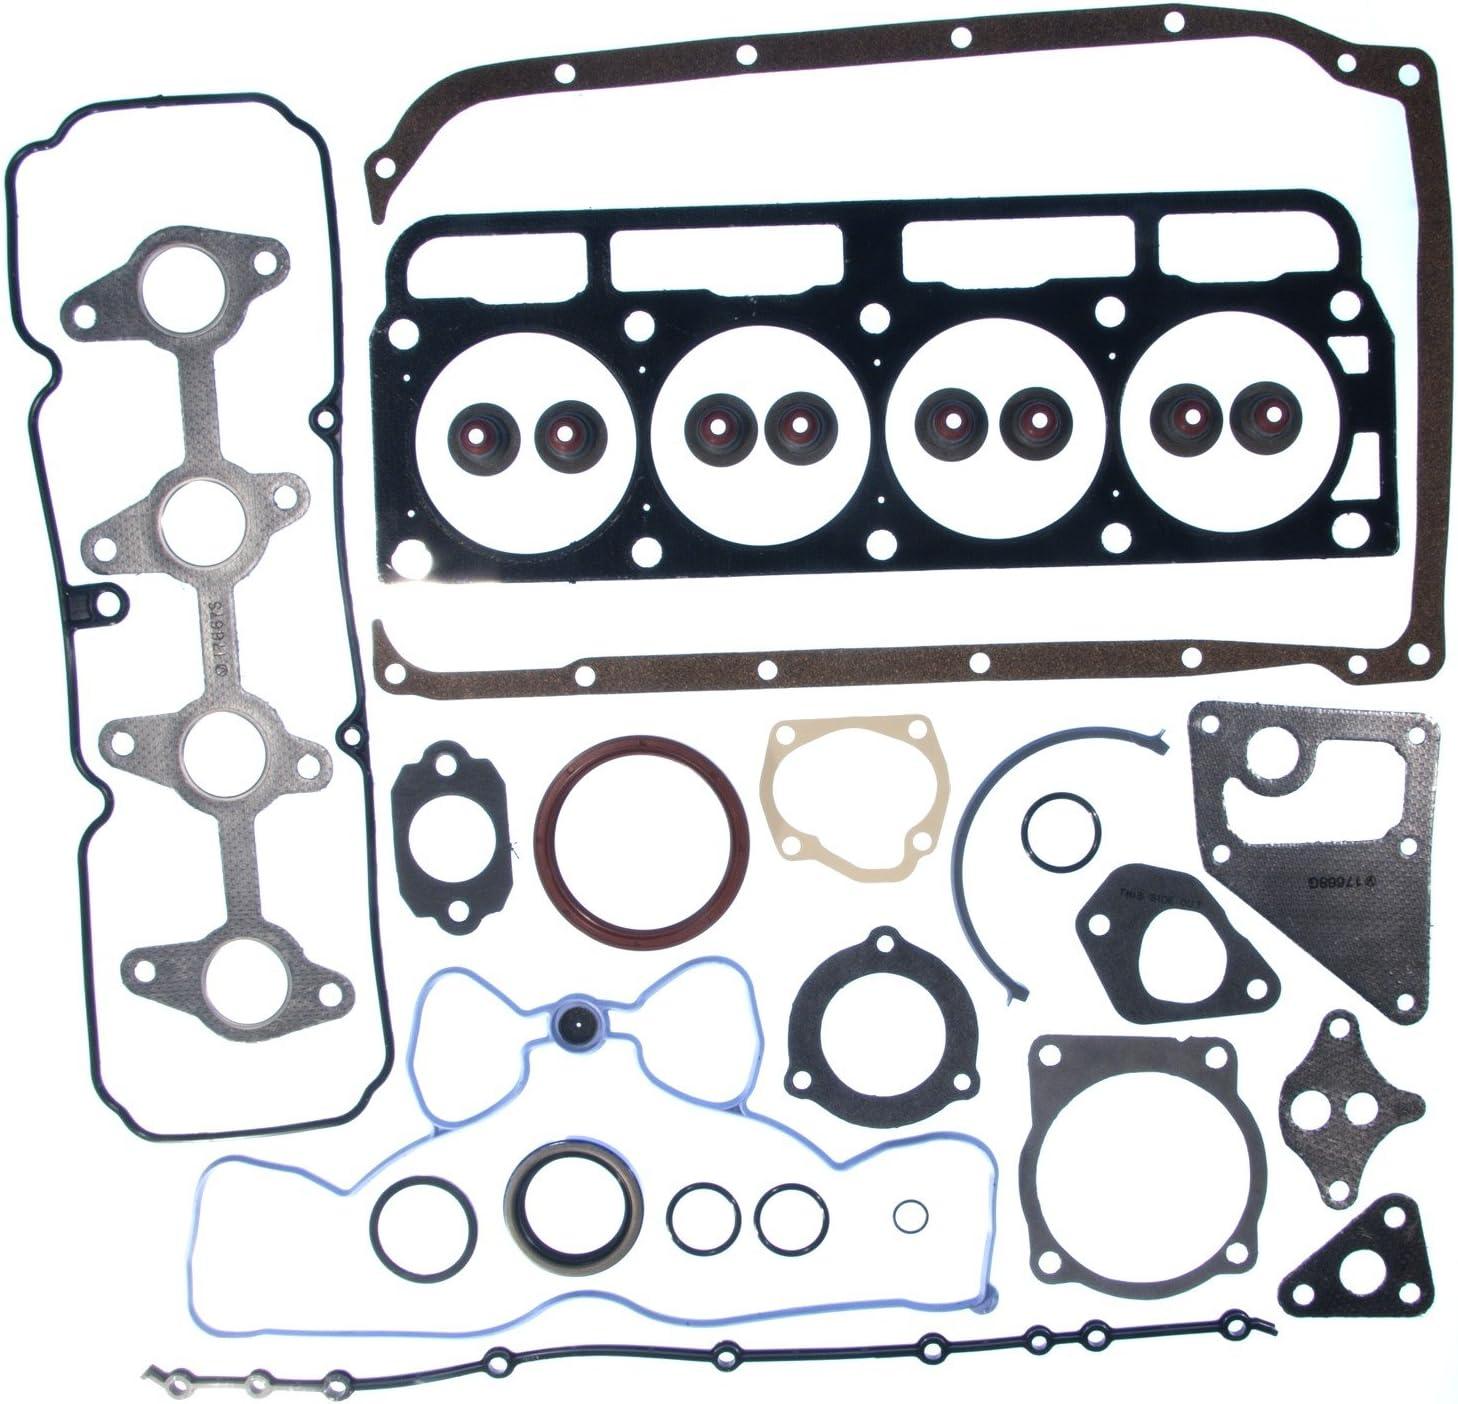 MAHLE Original 95-3696 Engine Kit Gasket Set